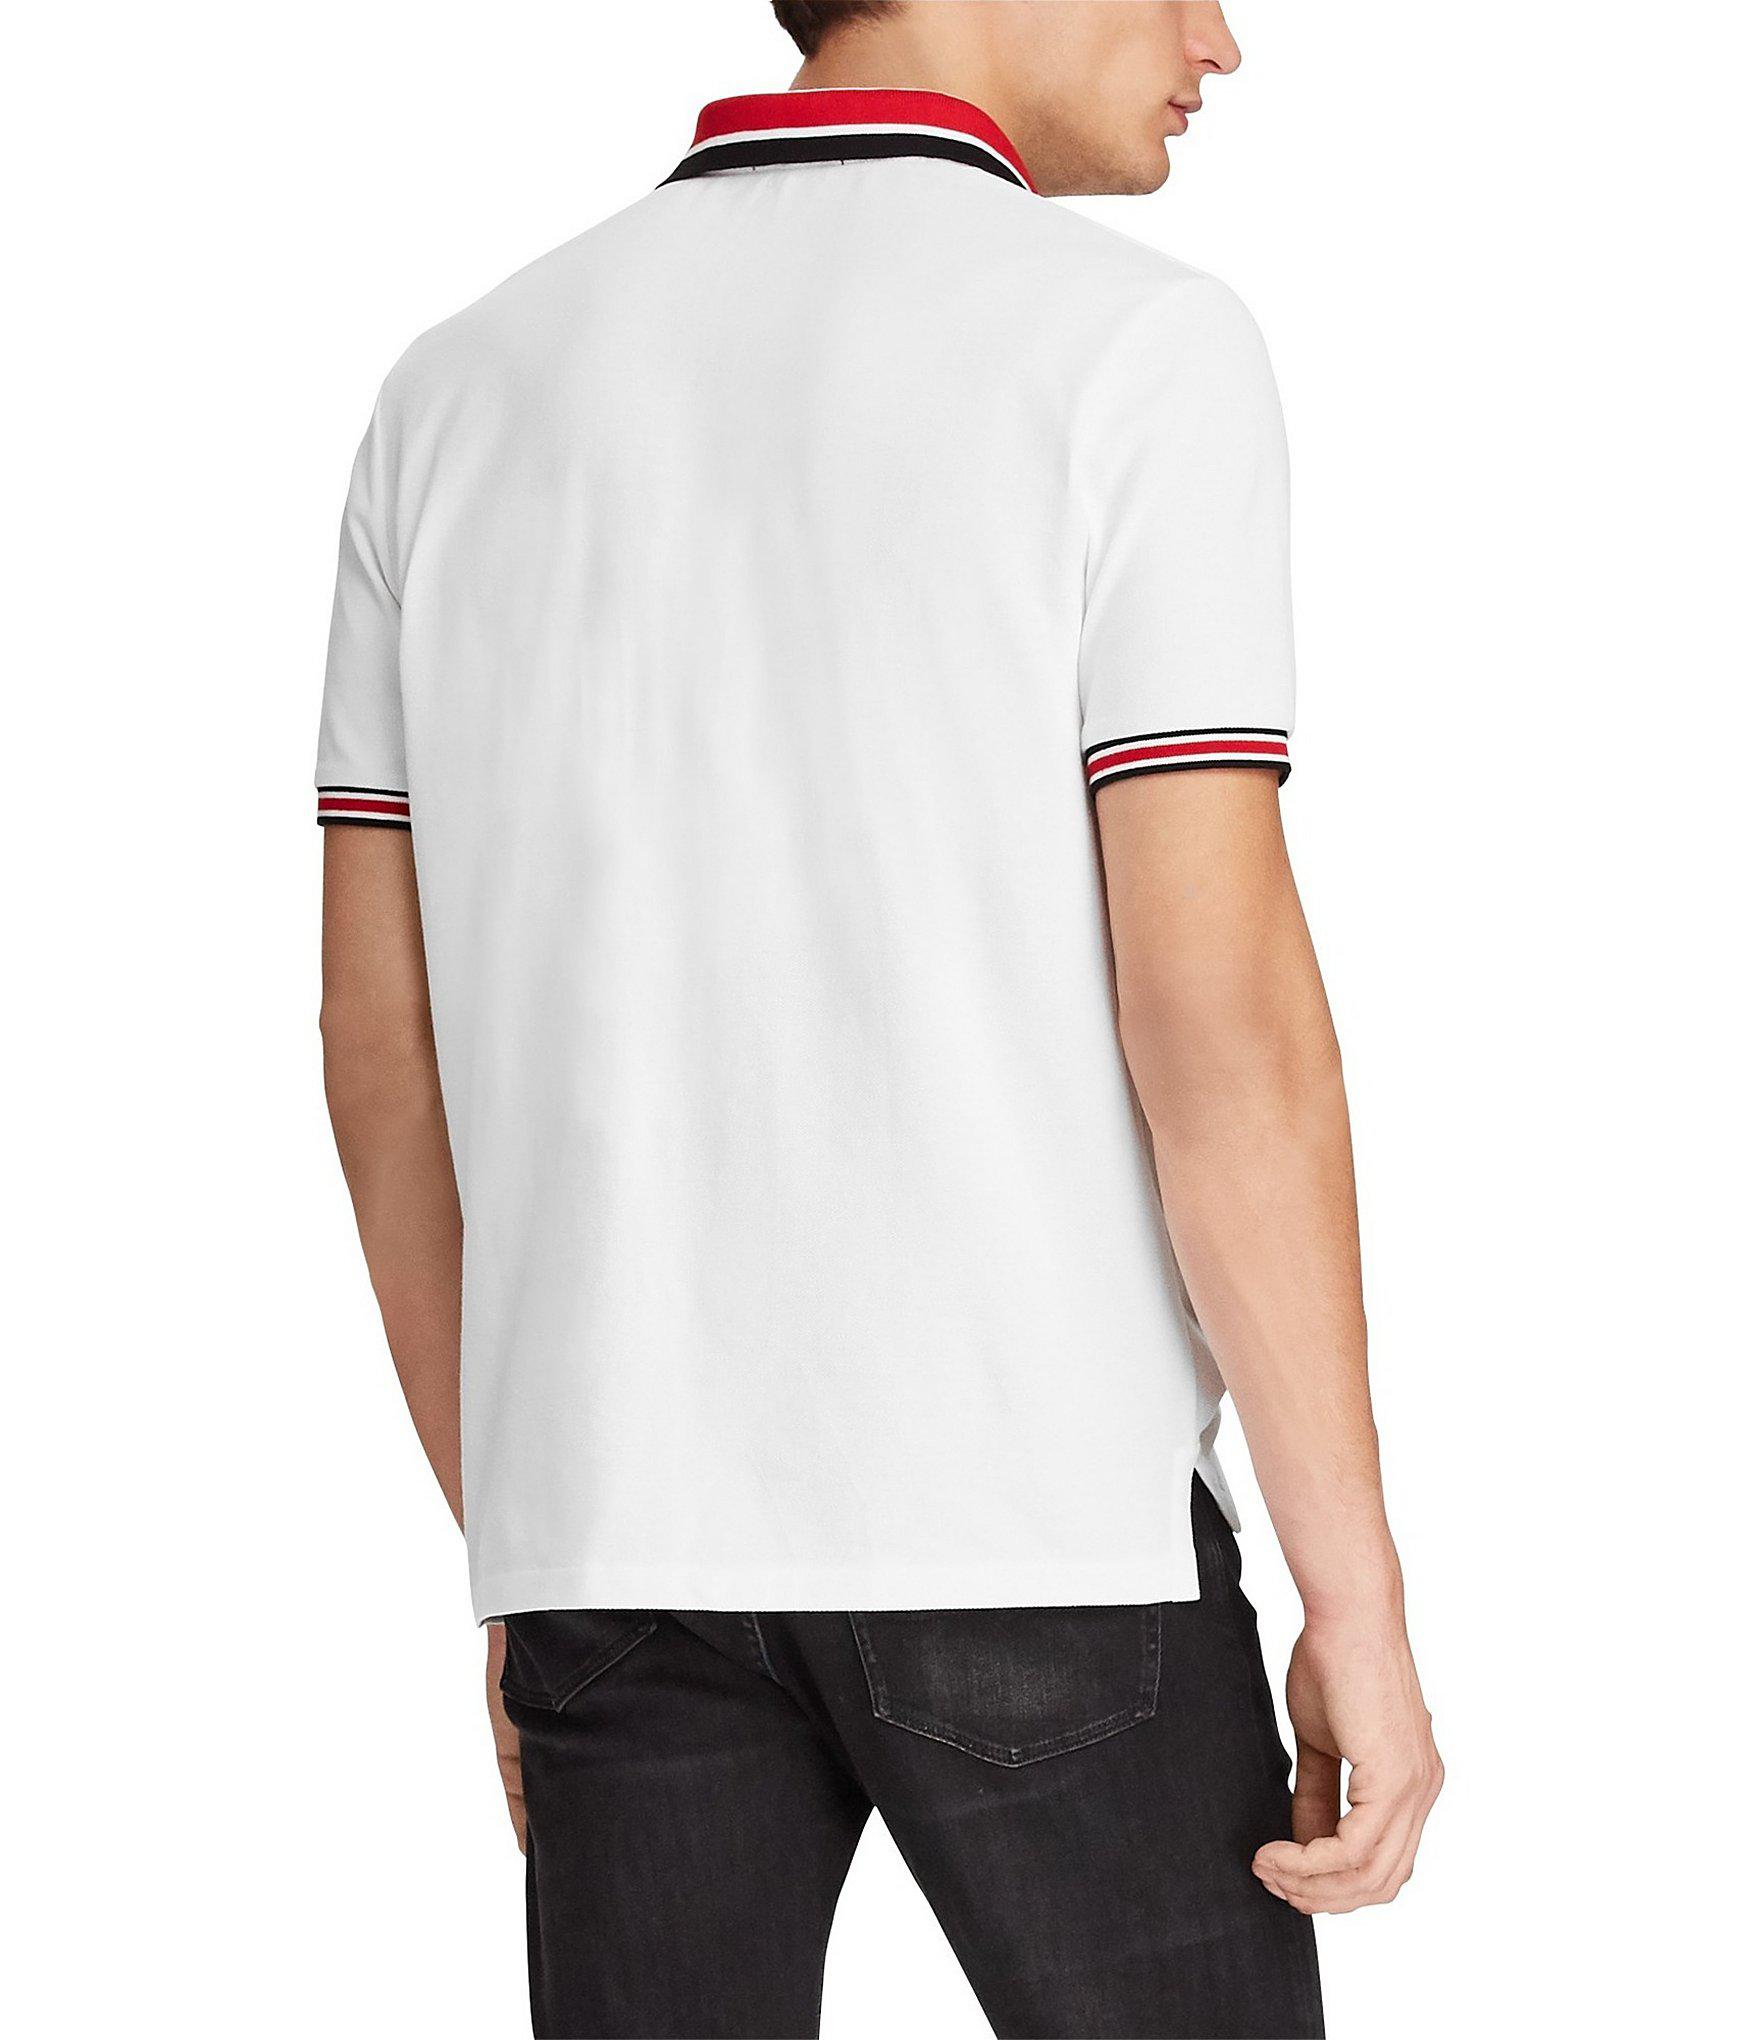 4068c288c Polo Ralph Lauren - White P-wing Mesh Classic Fit Polo Shirt for Men -.  View fullscreen